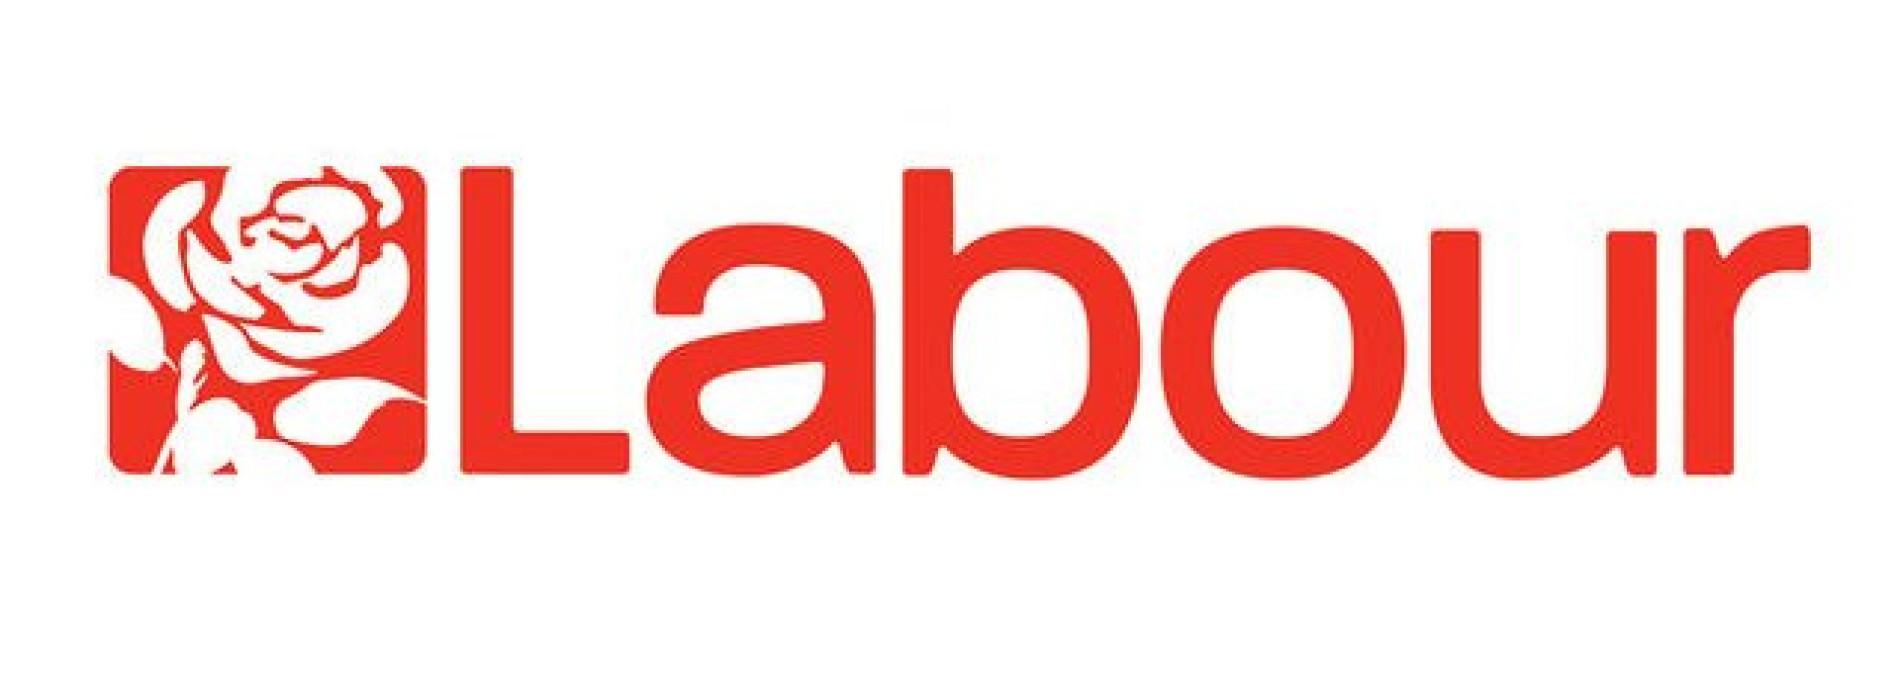 The labour